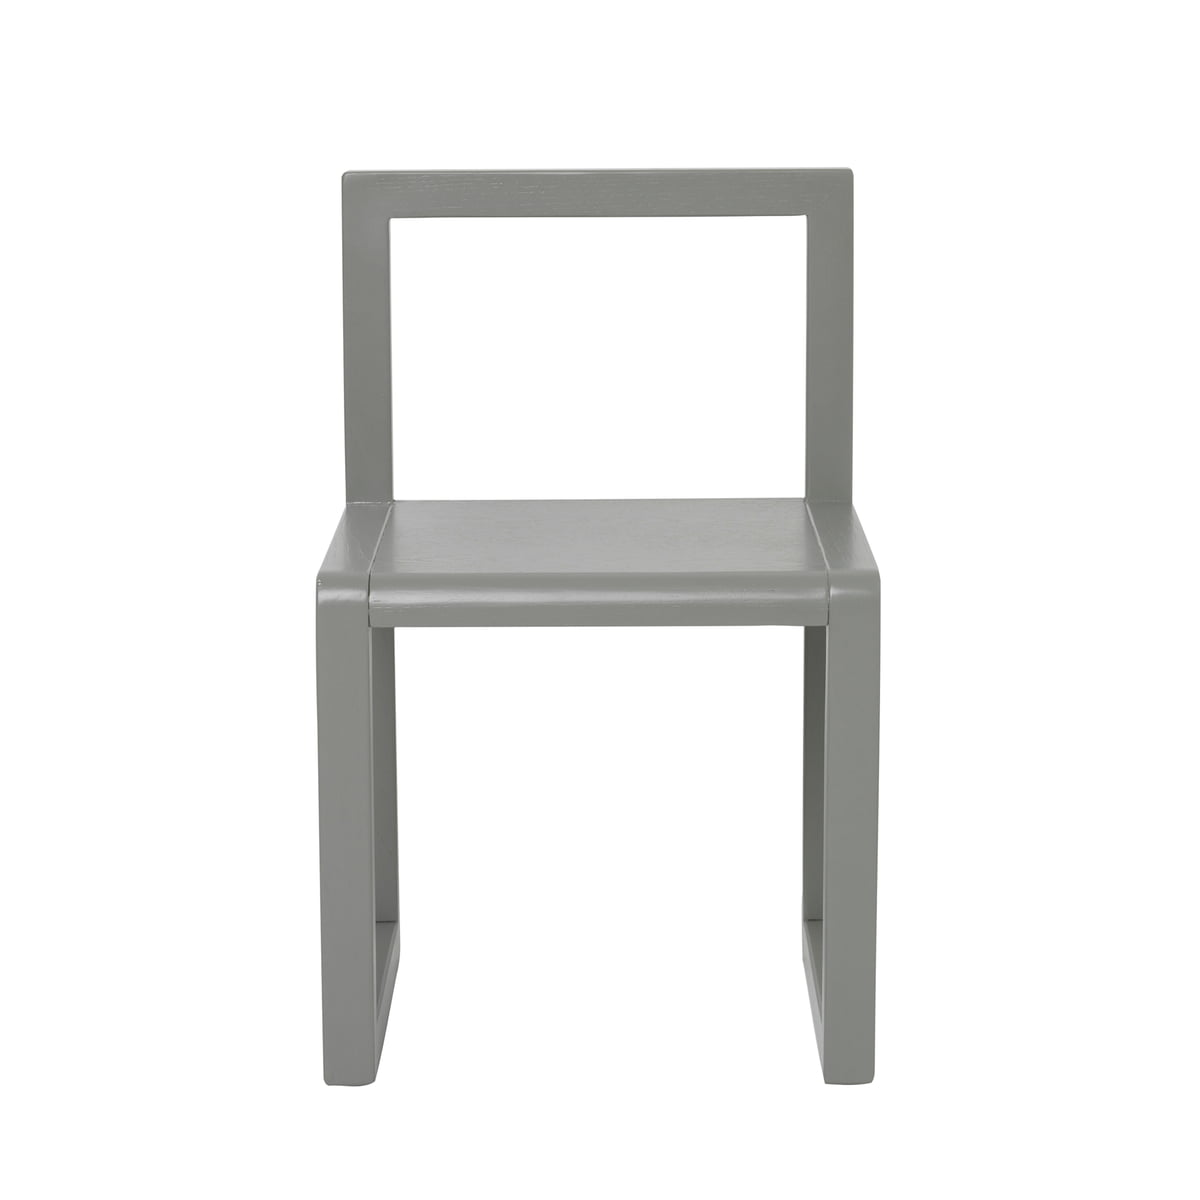 Awe Inspiring Ferm Living Little Architect Childrens Chair Grey Evergreenethics Interior Chair Design Evergreenethicsorg